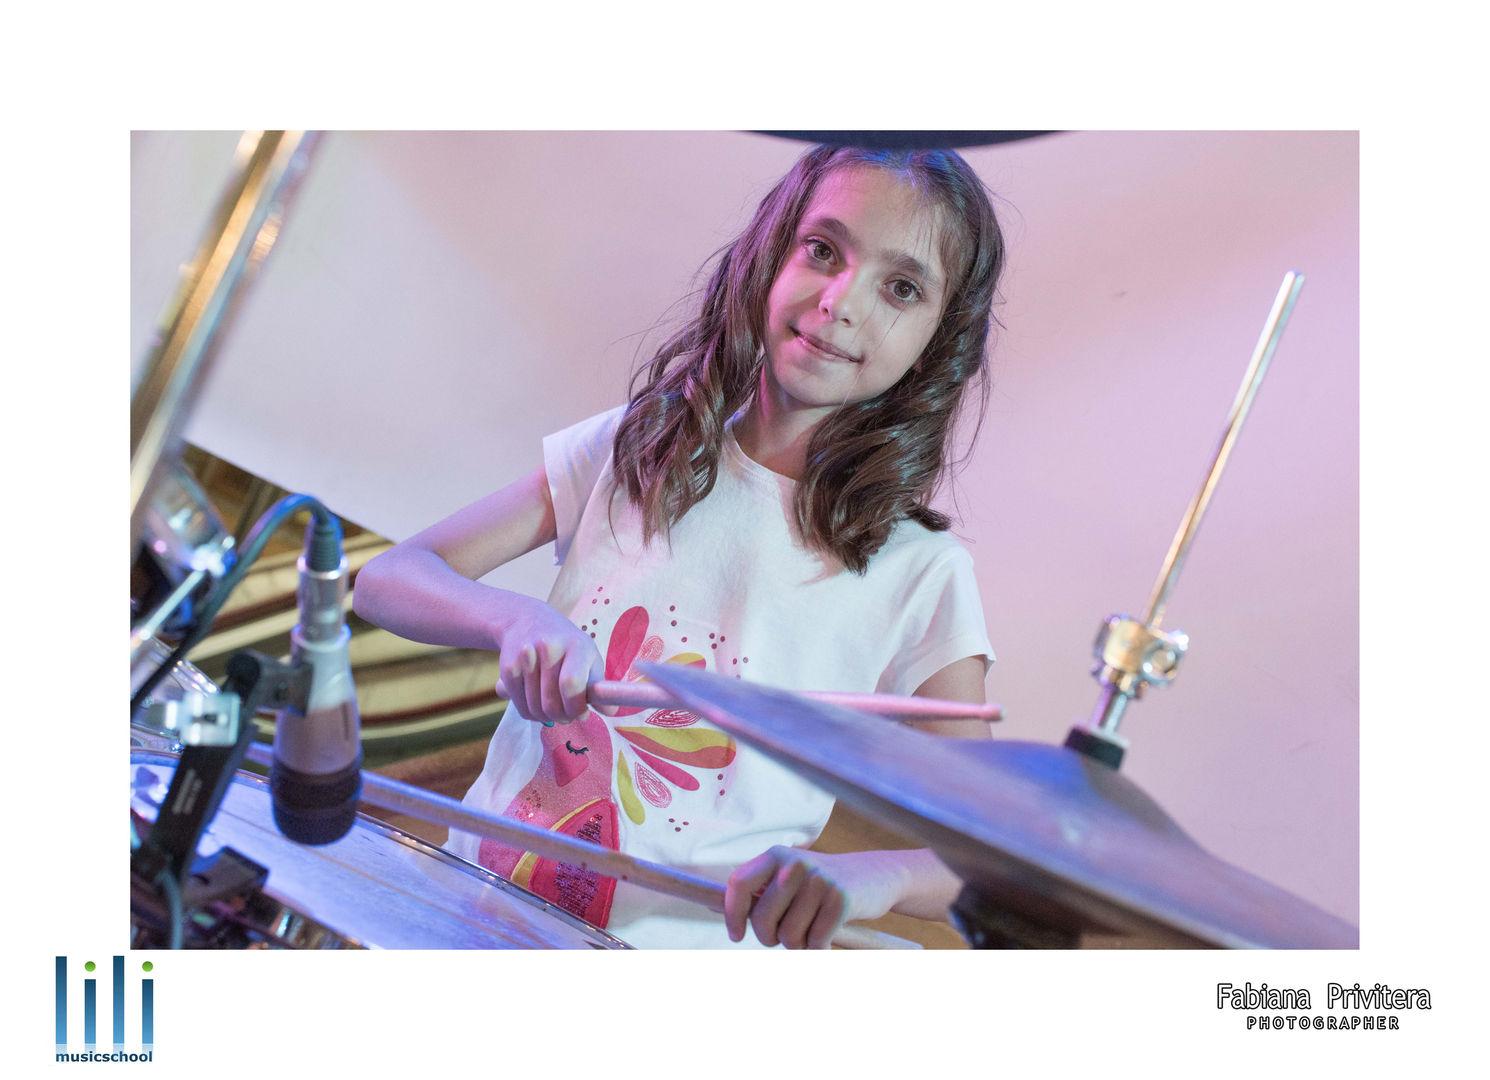 Bimbi lili 2018 Fabiana Privitera Photographer (8).jpg